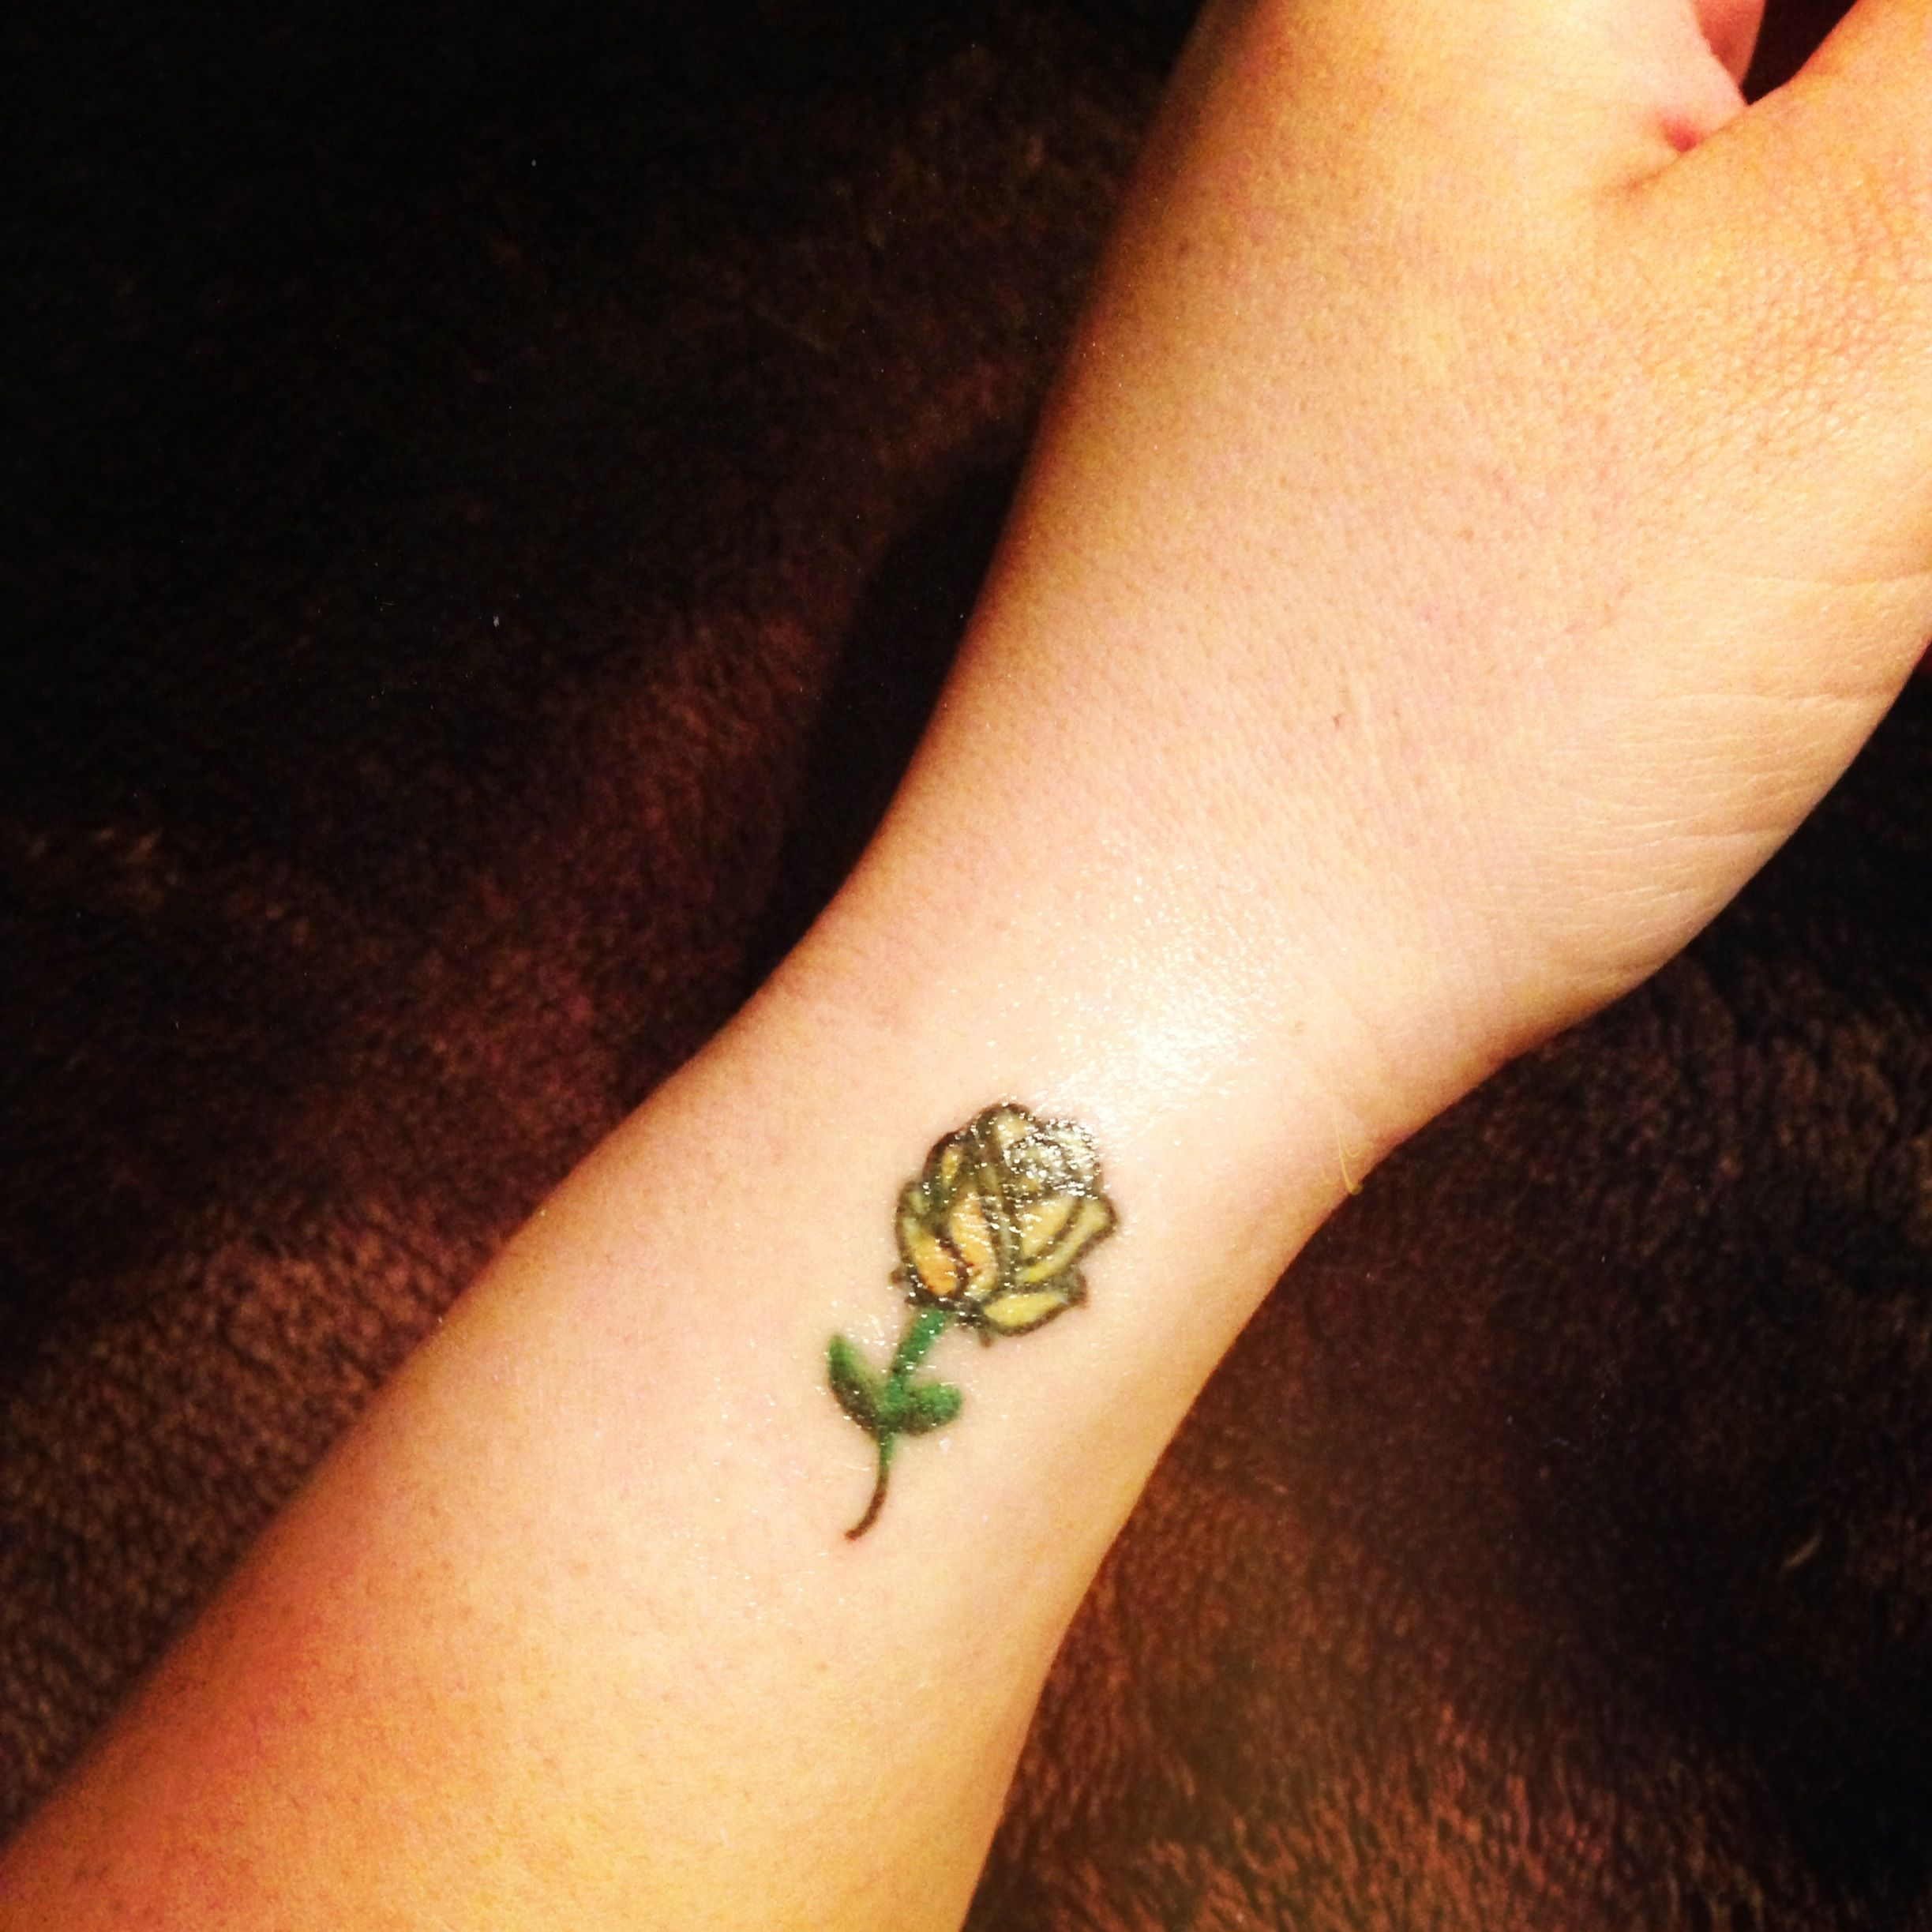 Tattoo Ideas Yellow Rose: Small Yellow Rose Tattoo